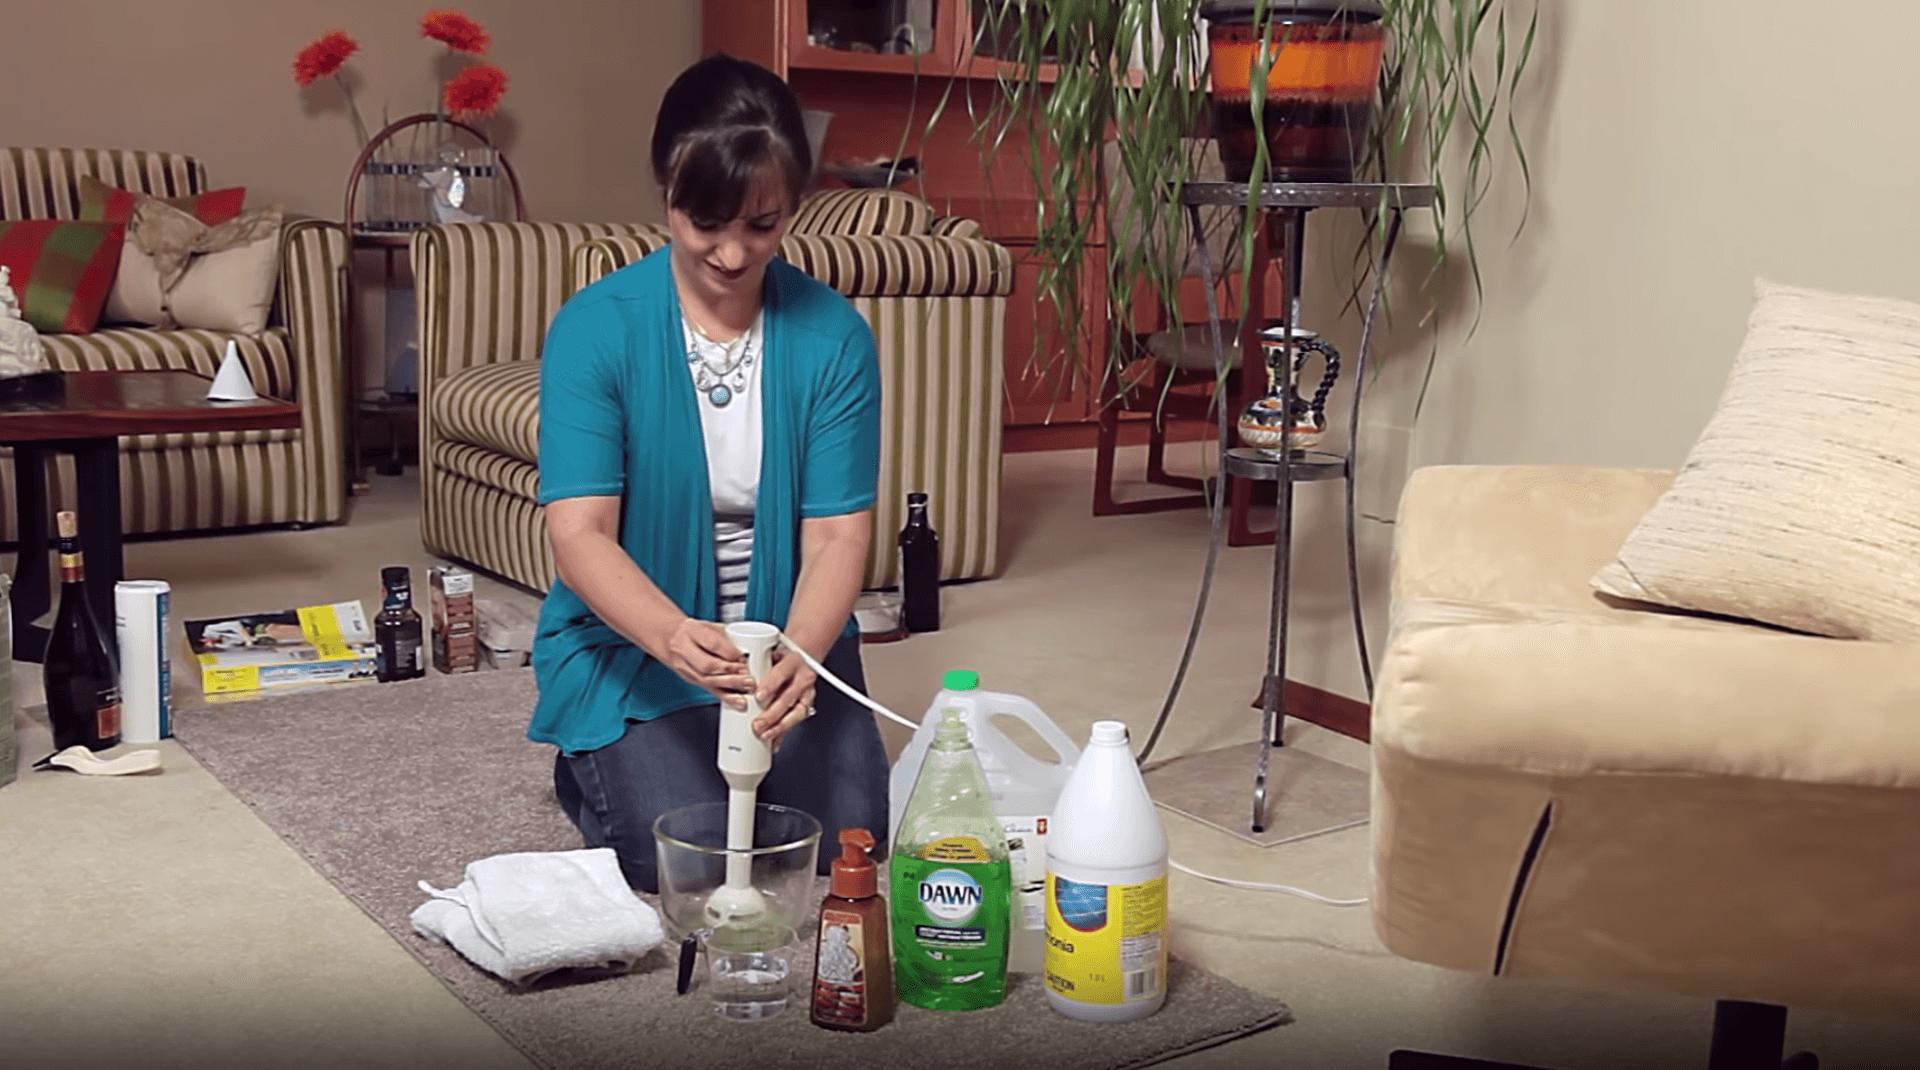 Carpet Cleaner Shampoo Alternatives